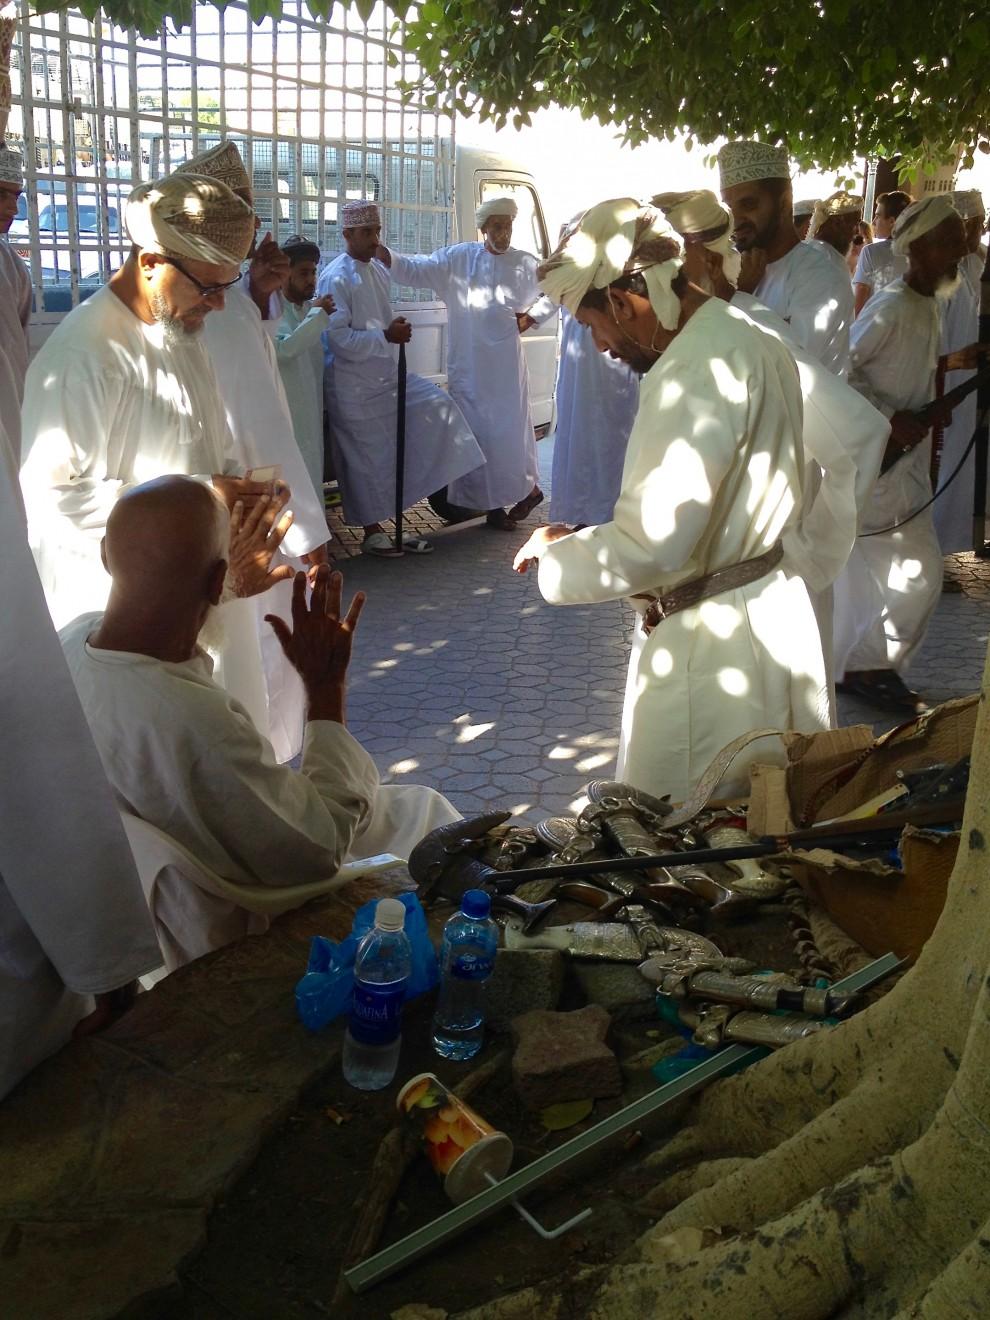 Al mercato si contratta la vendita di pugnali (khanjar)